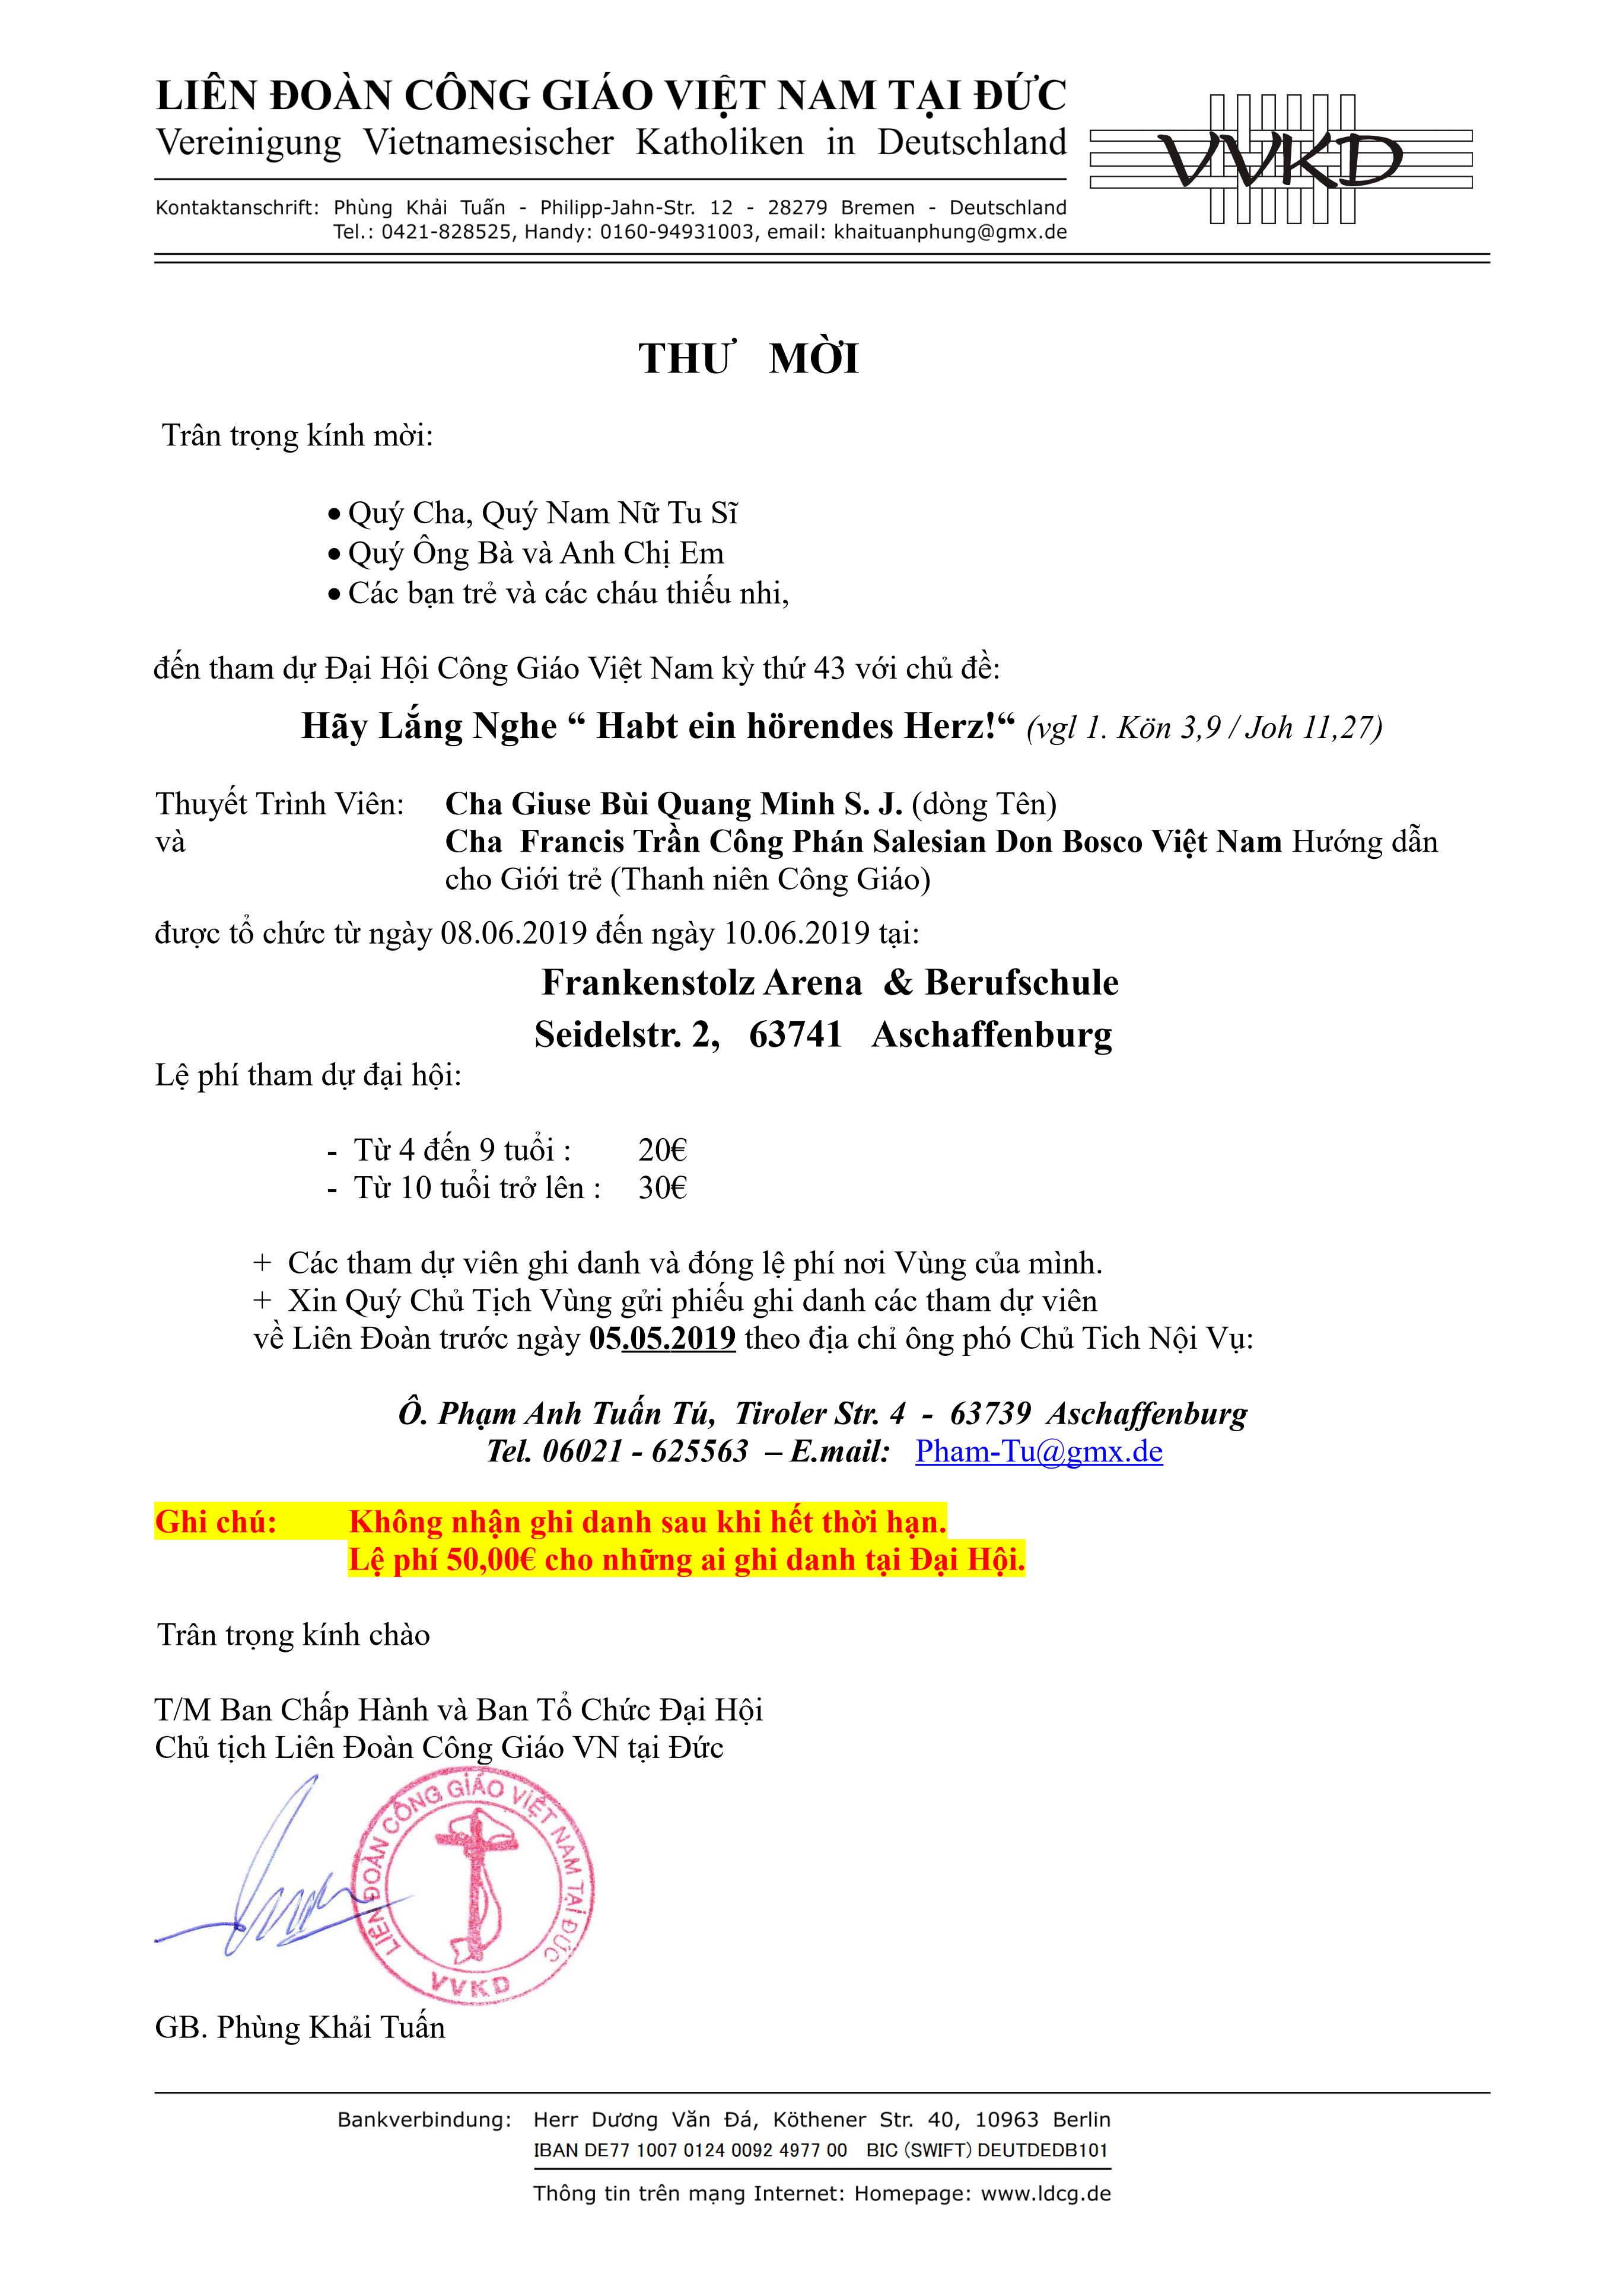 Thu Moi DHCG43